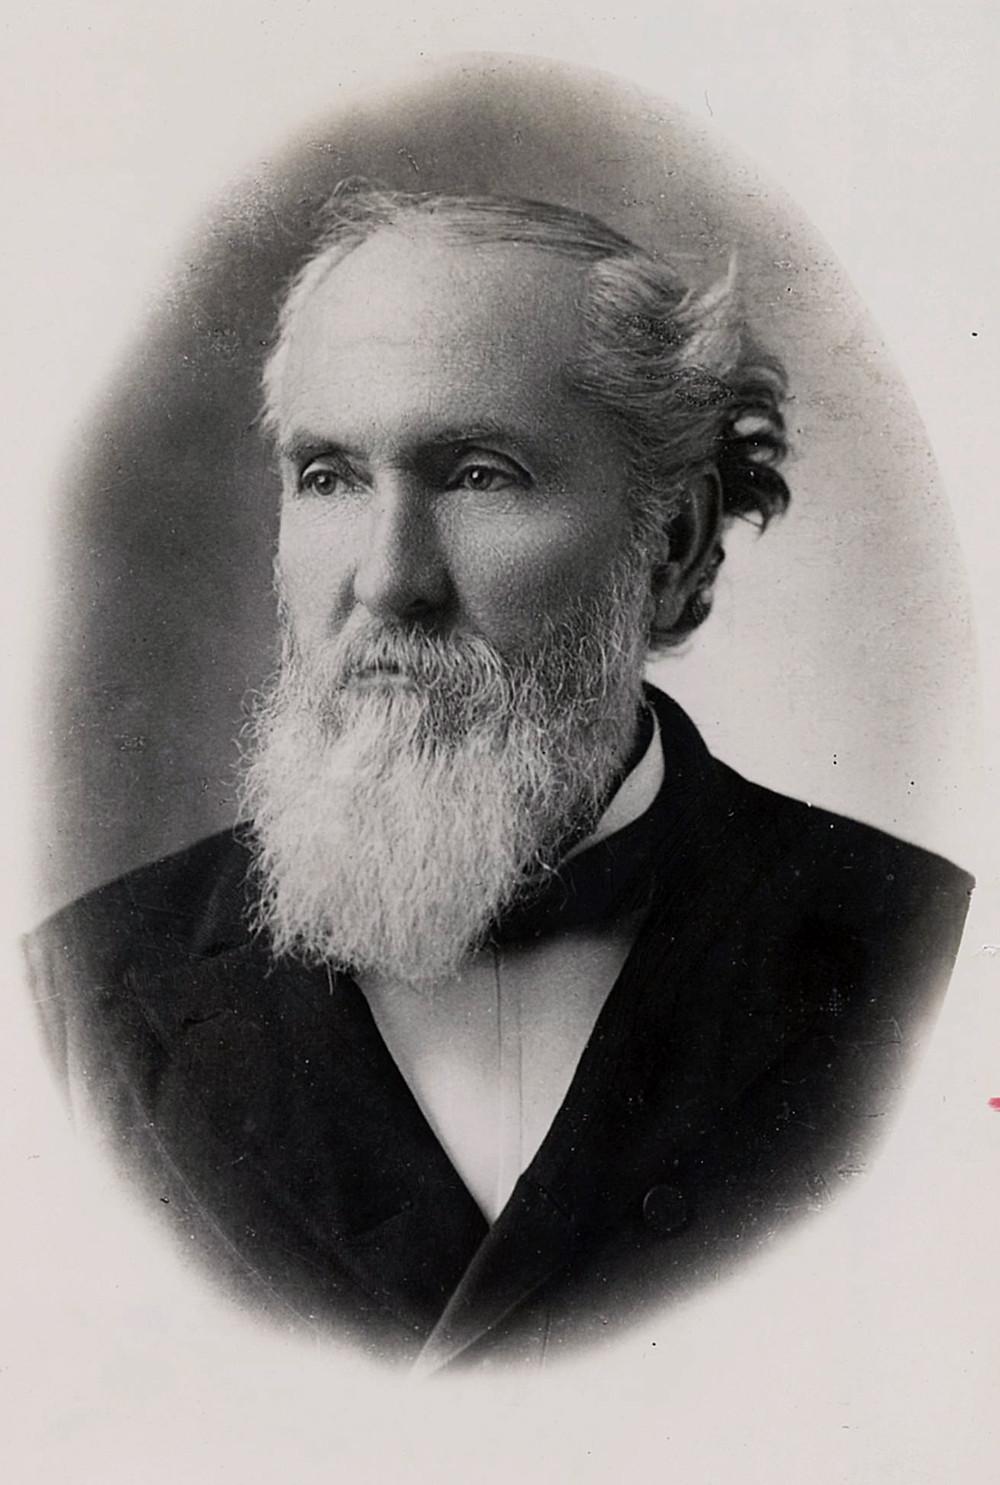 Rev. J.L. Vass